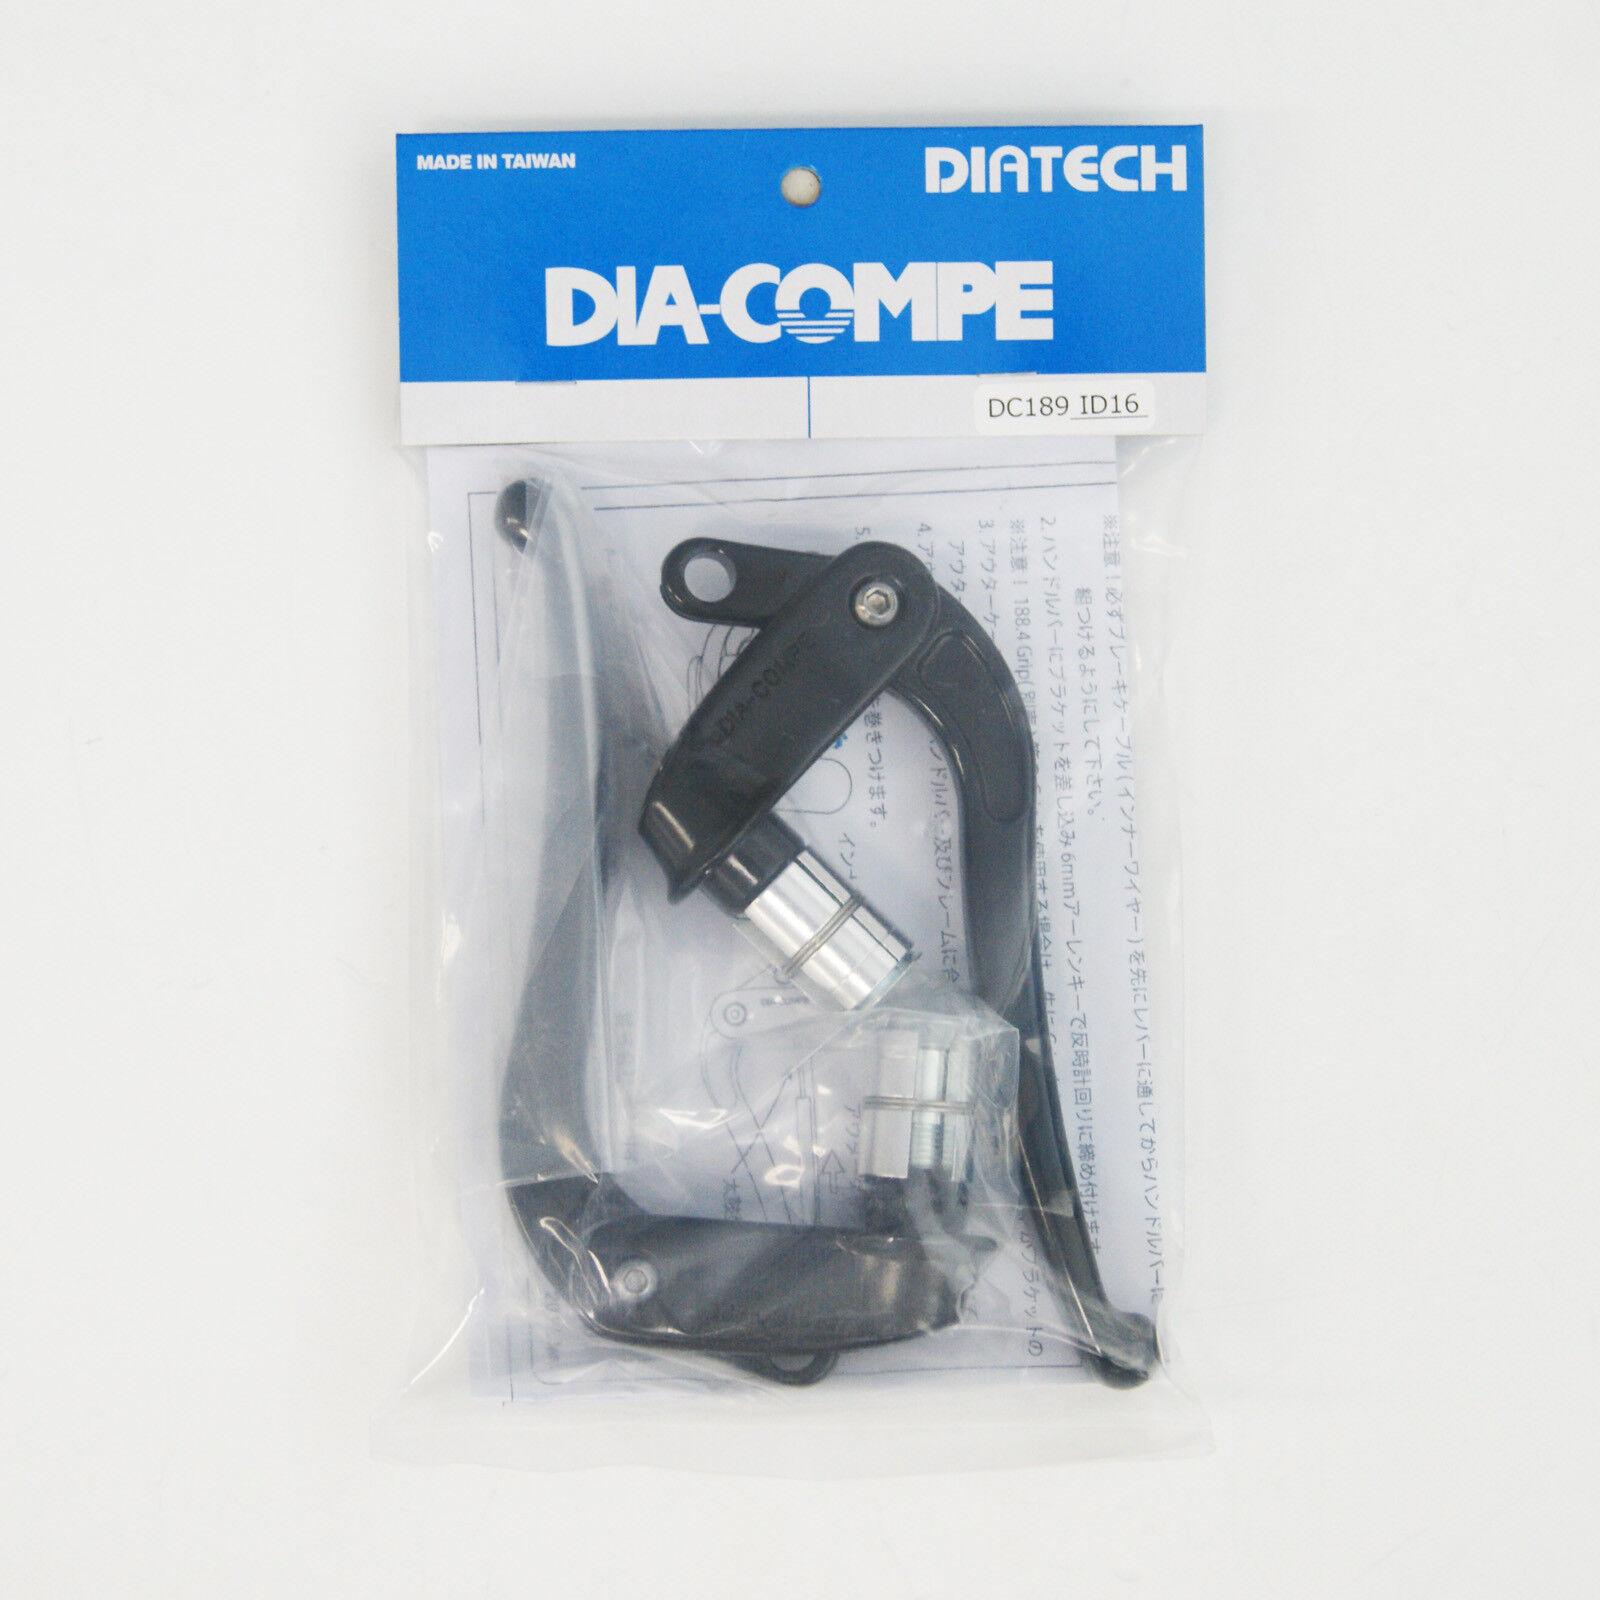 Dia-Compe DC189-ID16 Leva Freno Sinistra e Destra (Paio) schwarz